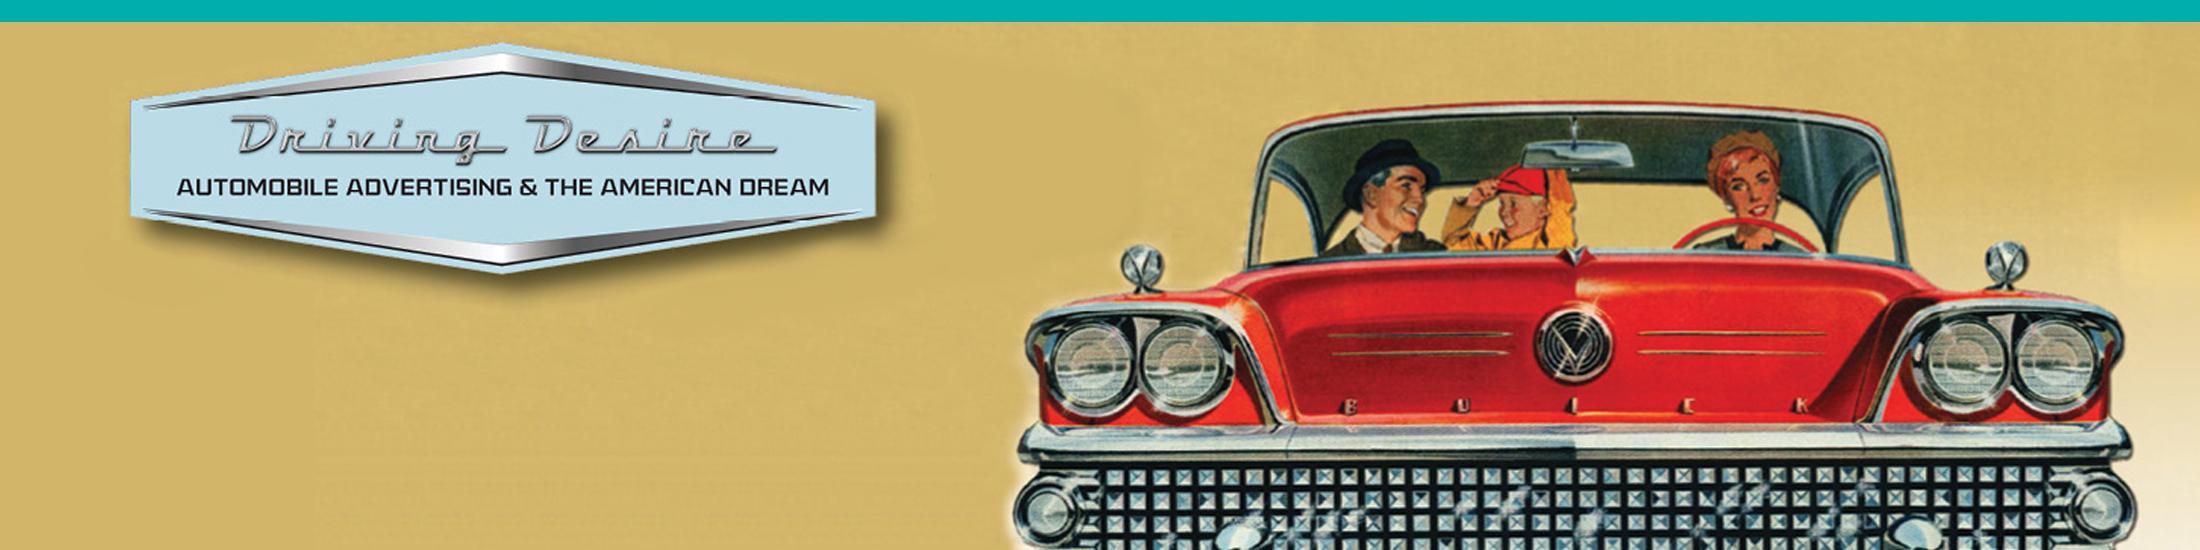 Vintage car advertisement